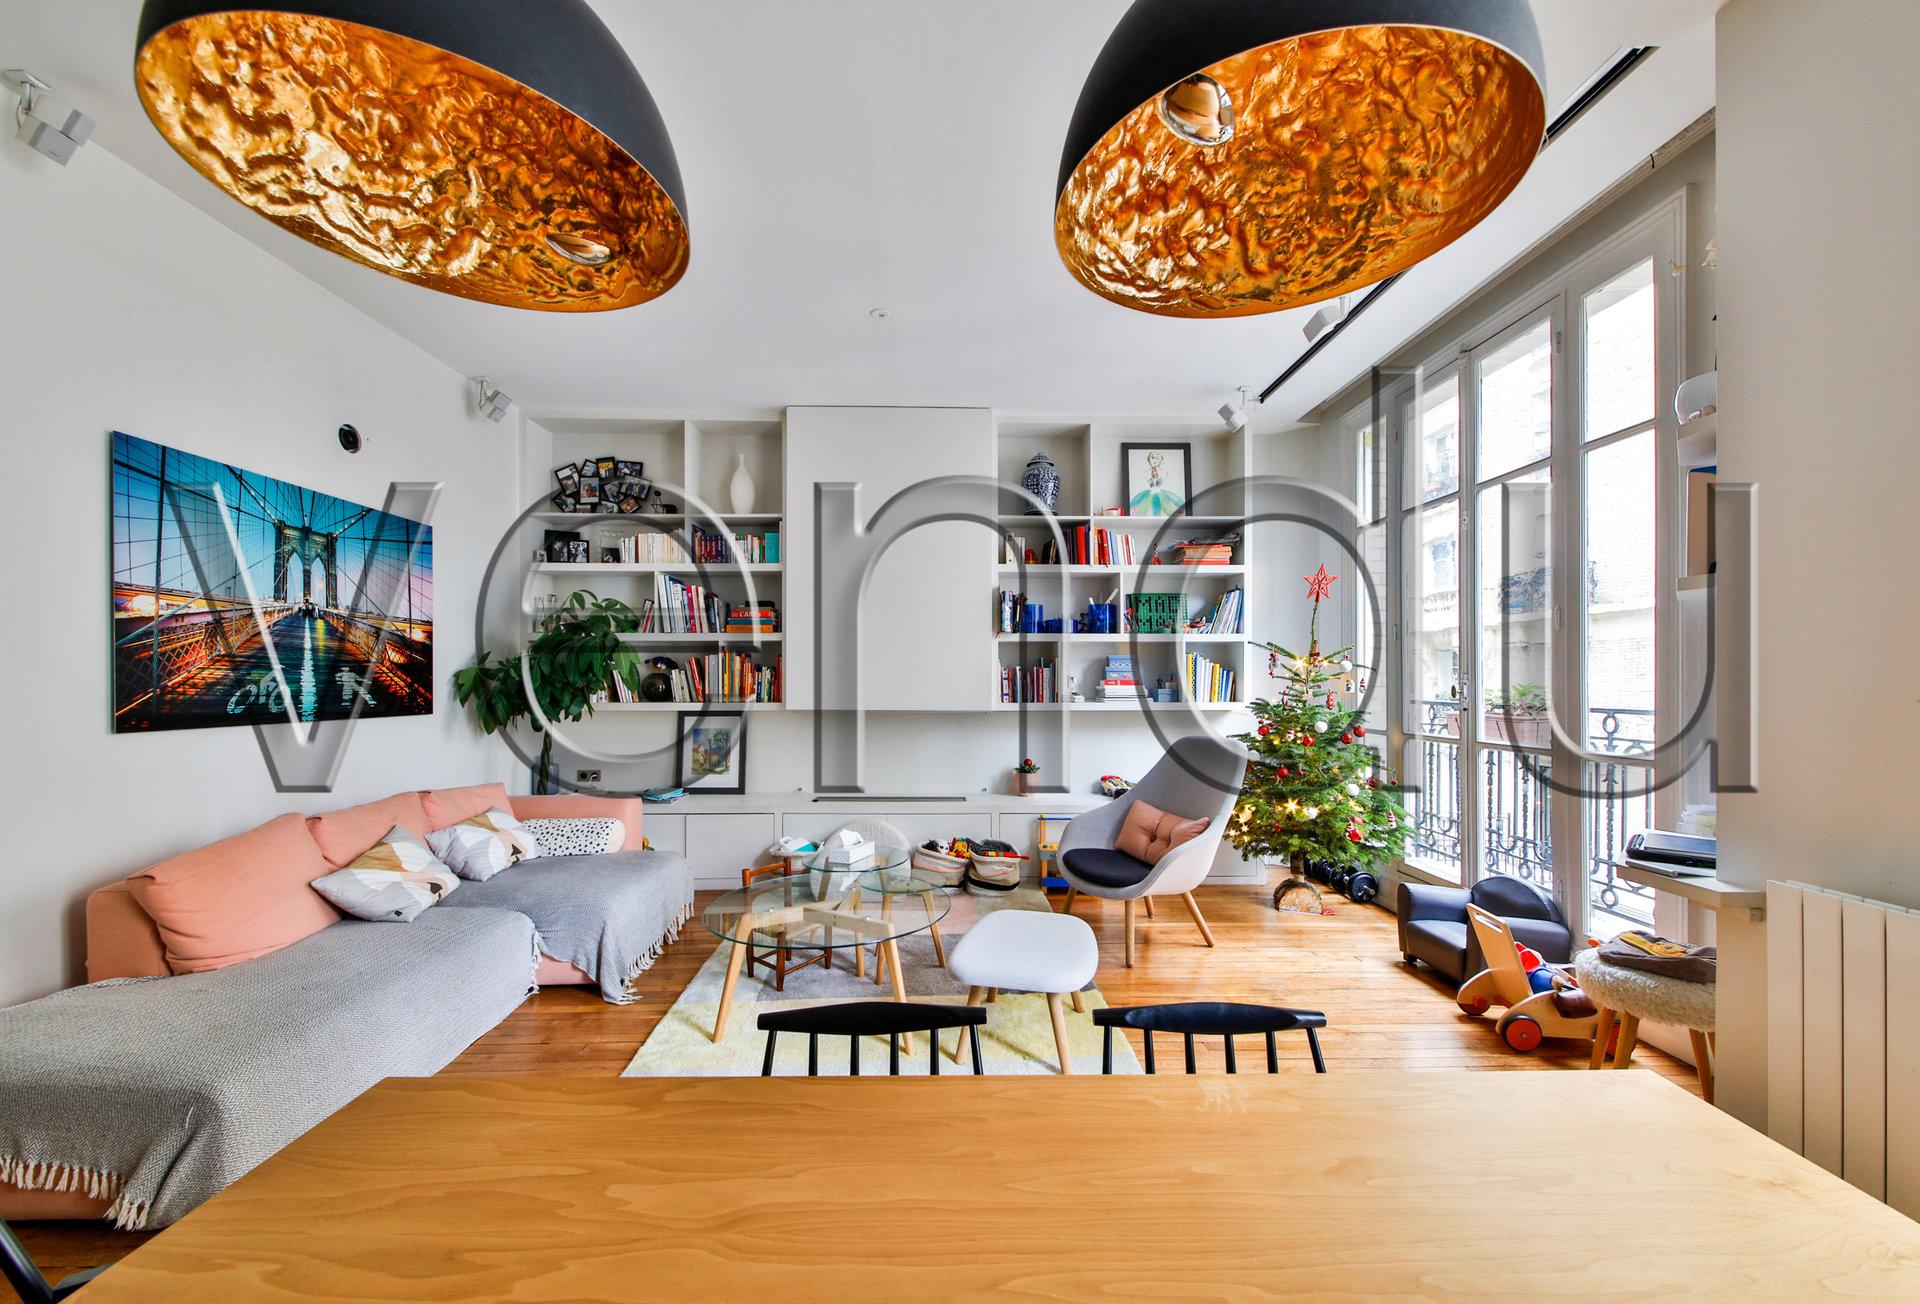 CAULAINCOURT/JUNOT appartement familial